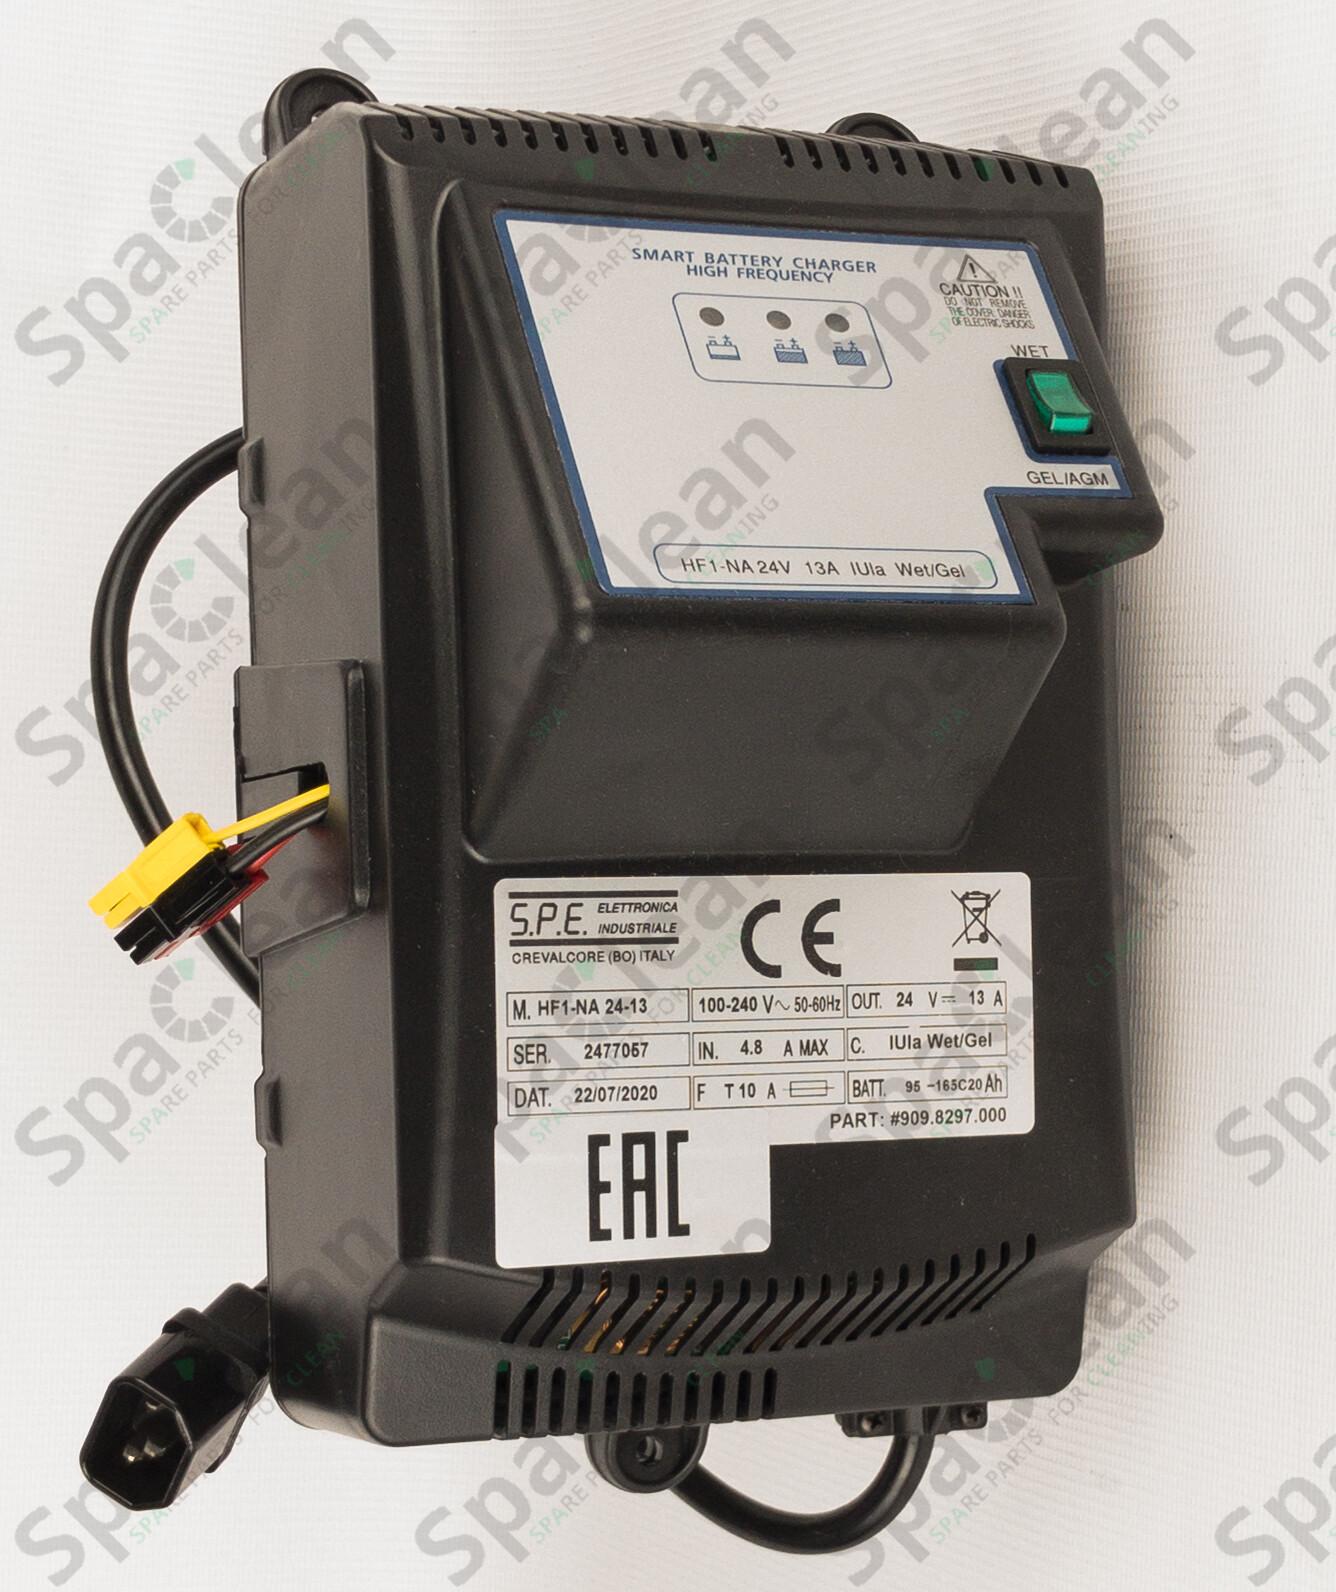 Зарядное устройство HF1 NA 24V 13A *9098297000